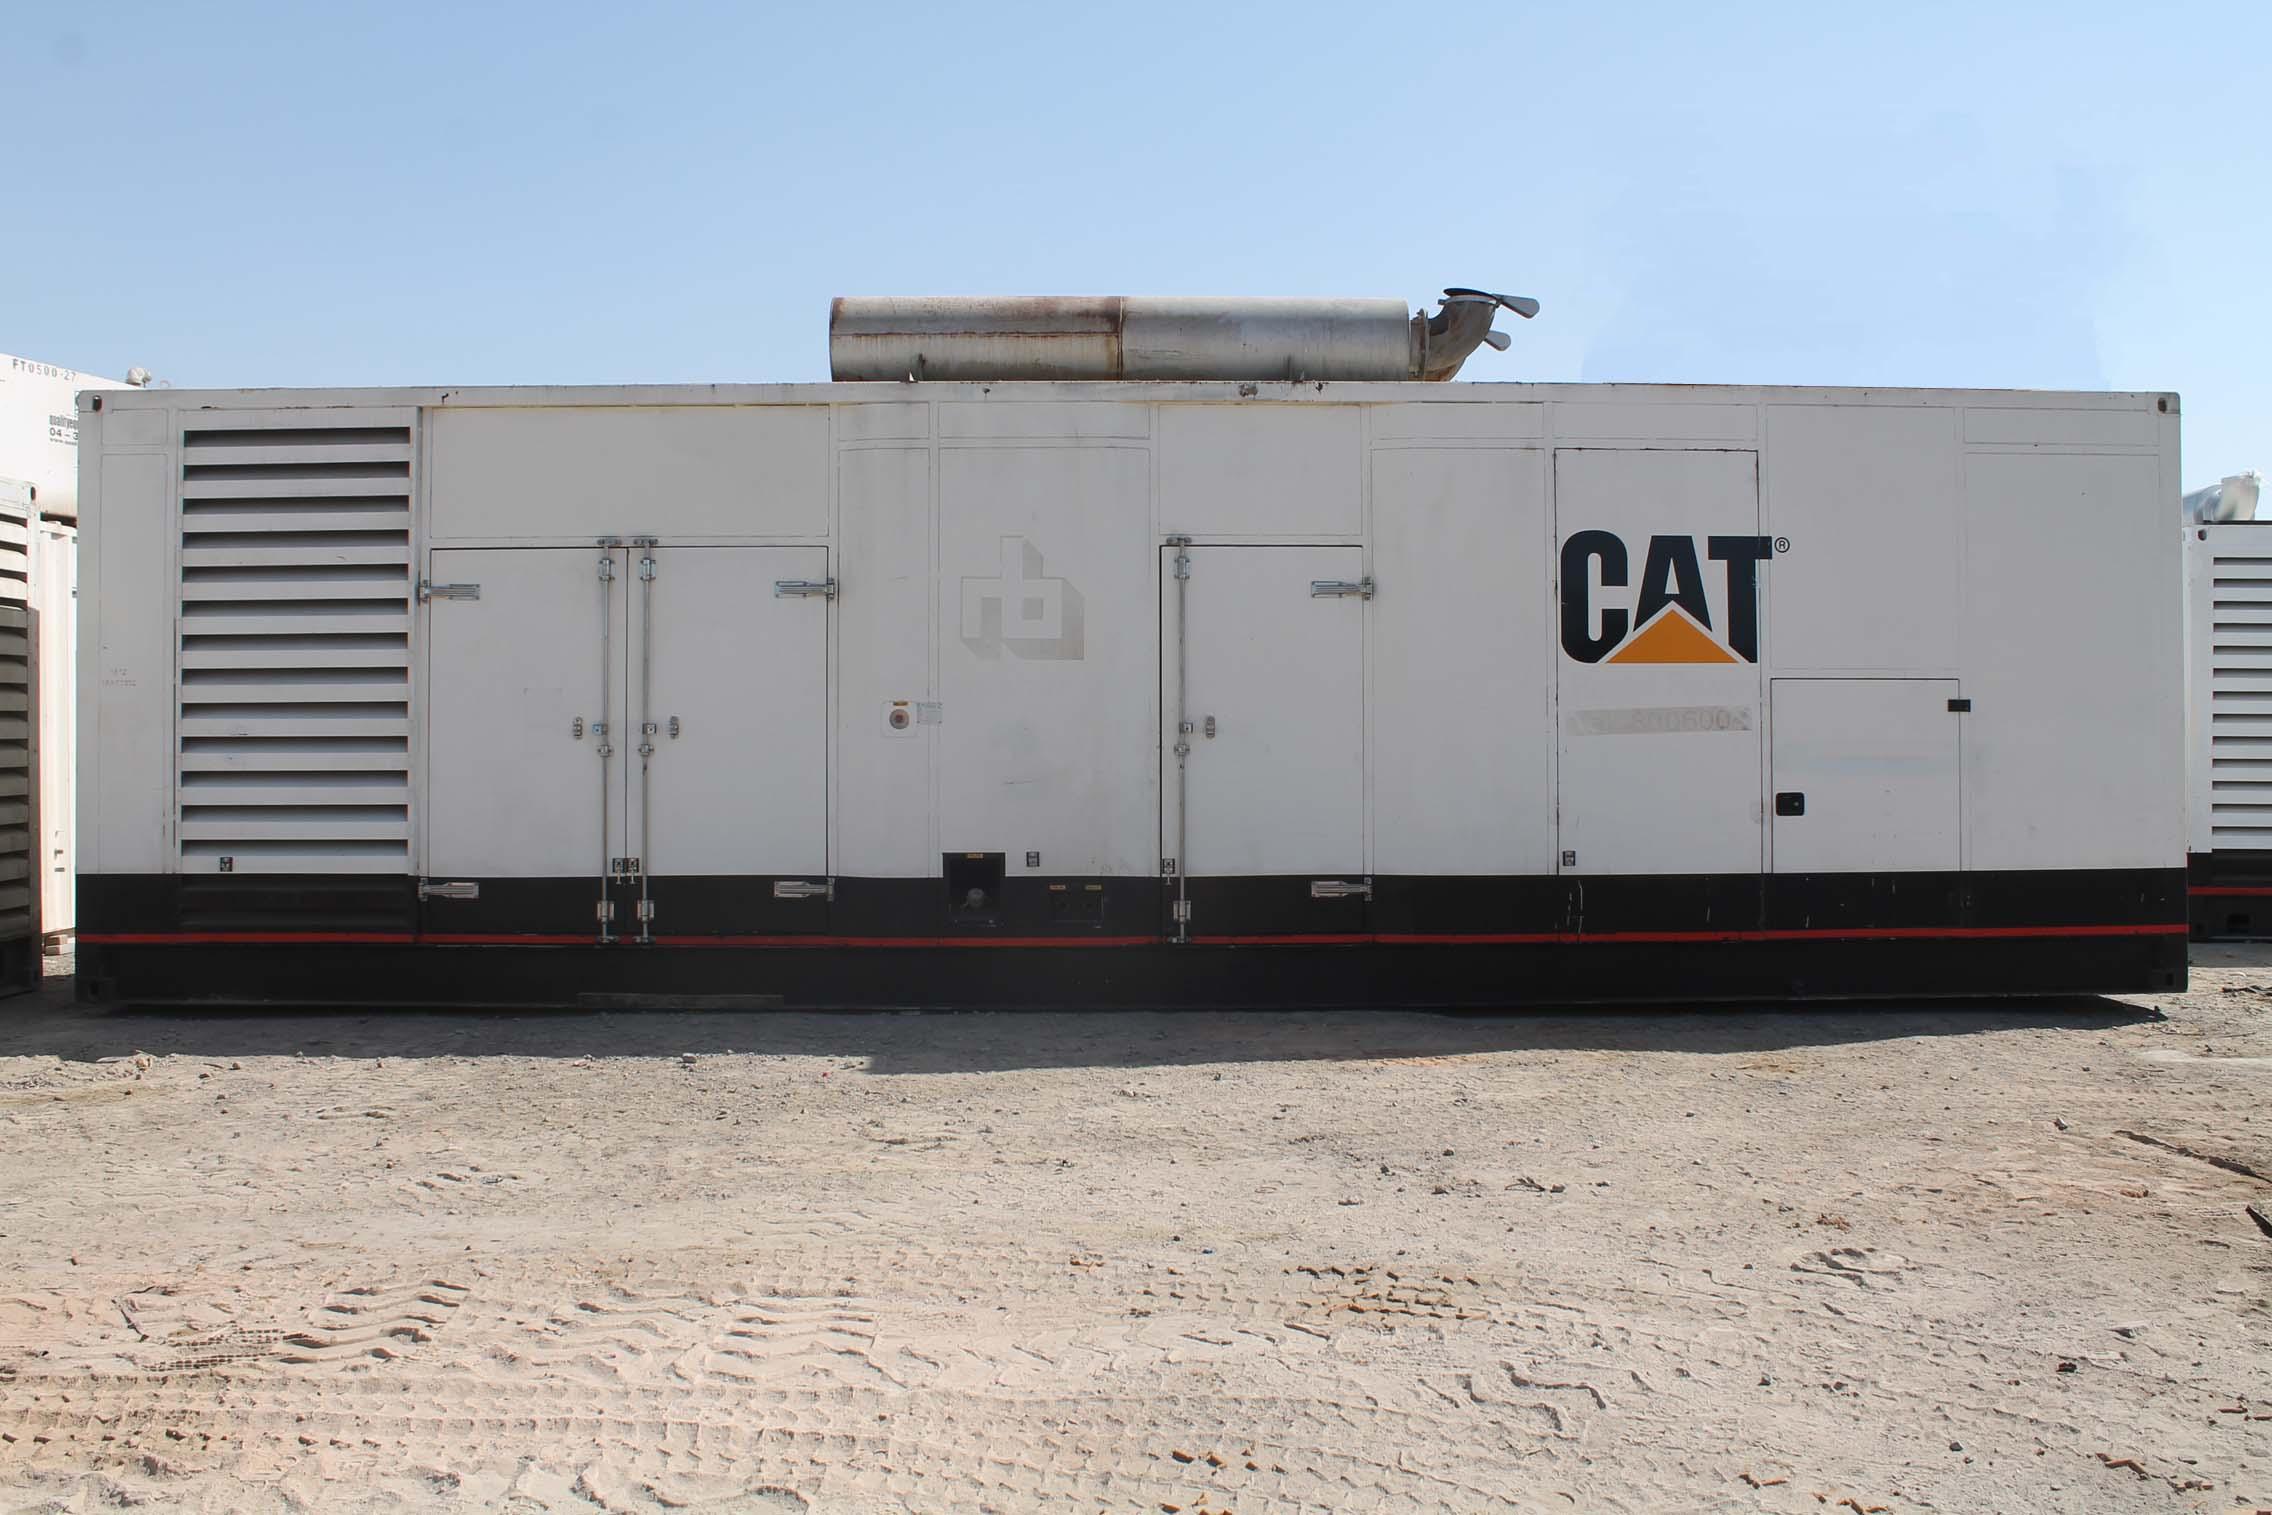 2010-caterpillar-3512b-equipment-cover-image